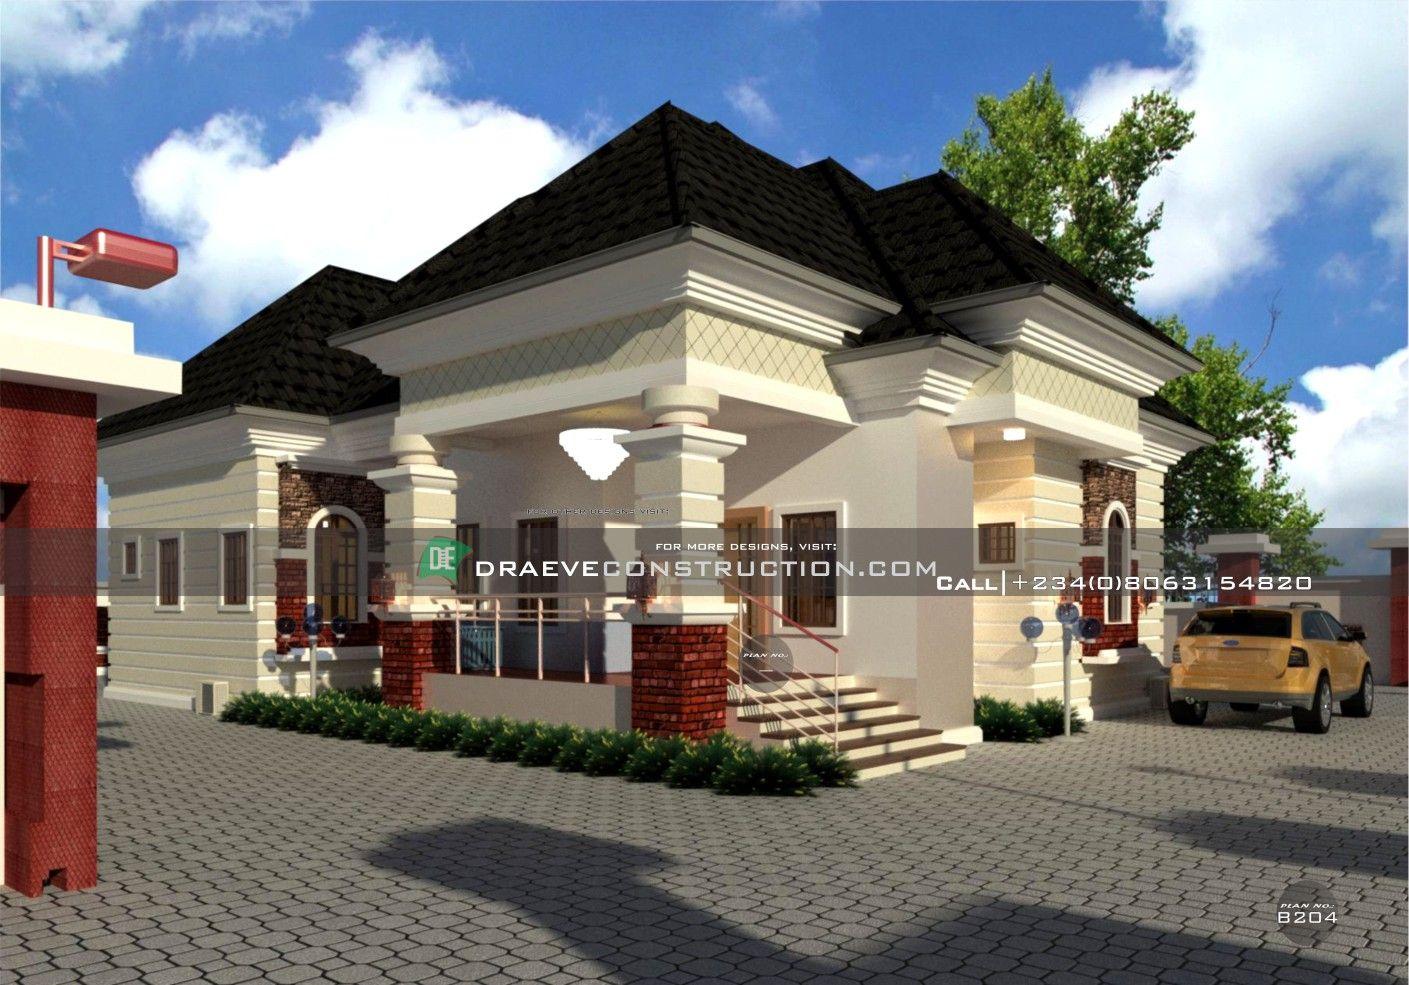 4 Bedroom Bungalow Design In Nigeria In 2020 Building House Plans Designs Bungalow Design Bungalow House Design